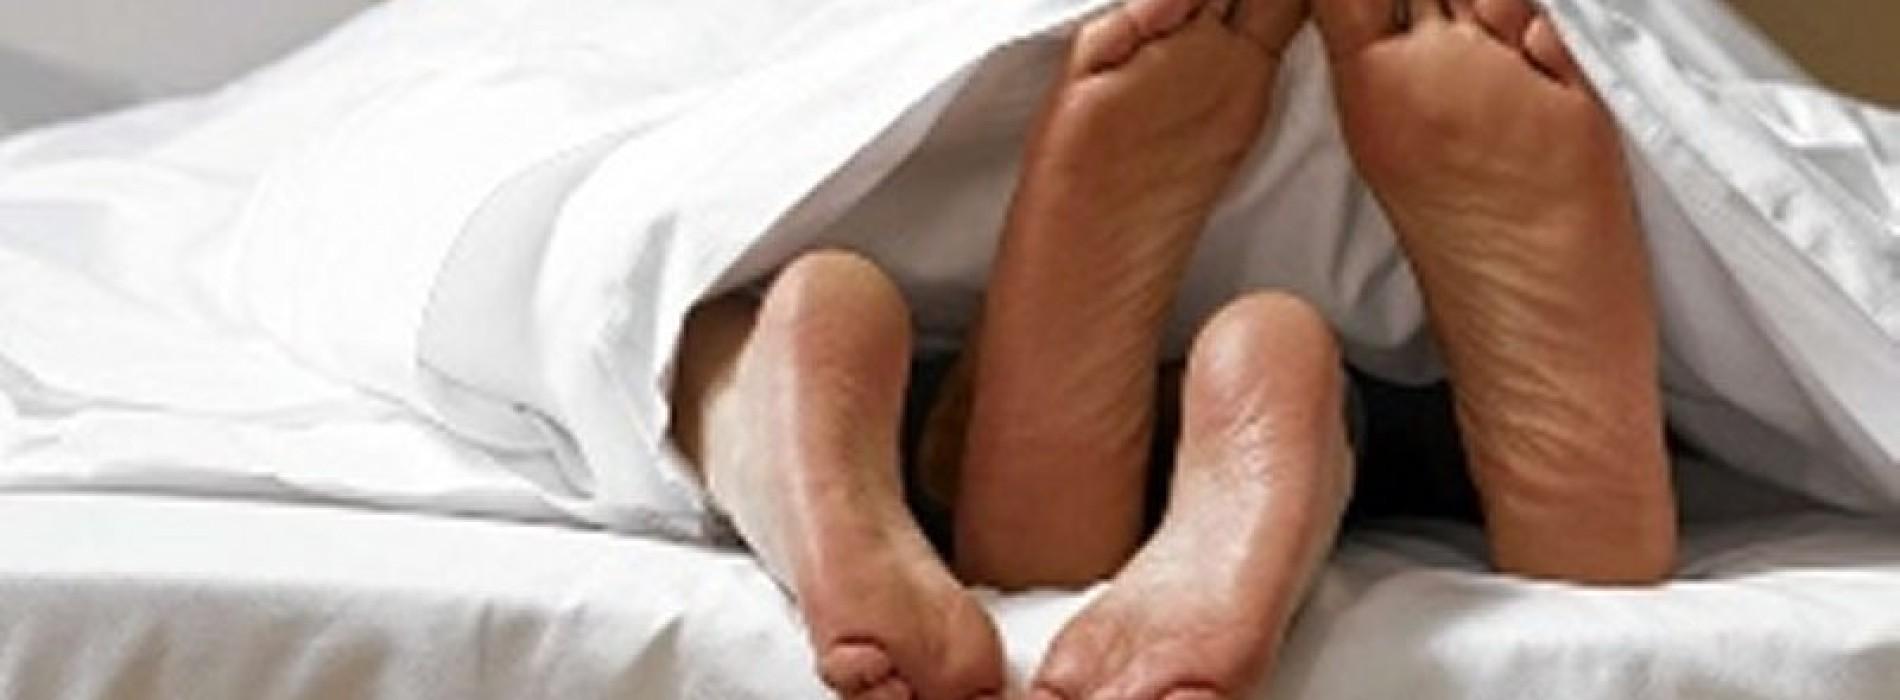 Faiza Siddiqui: my sex life after injury